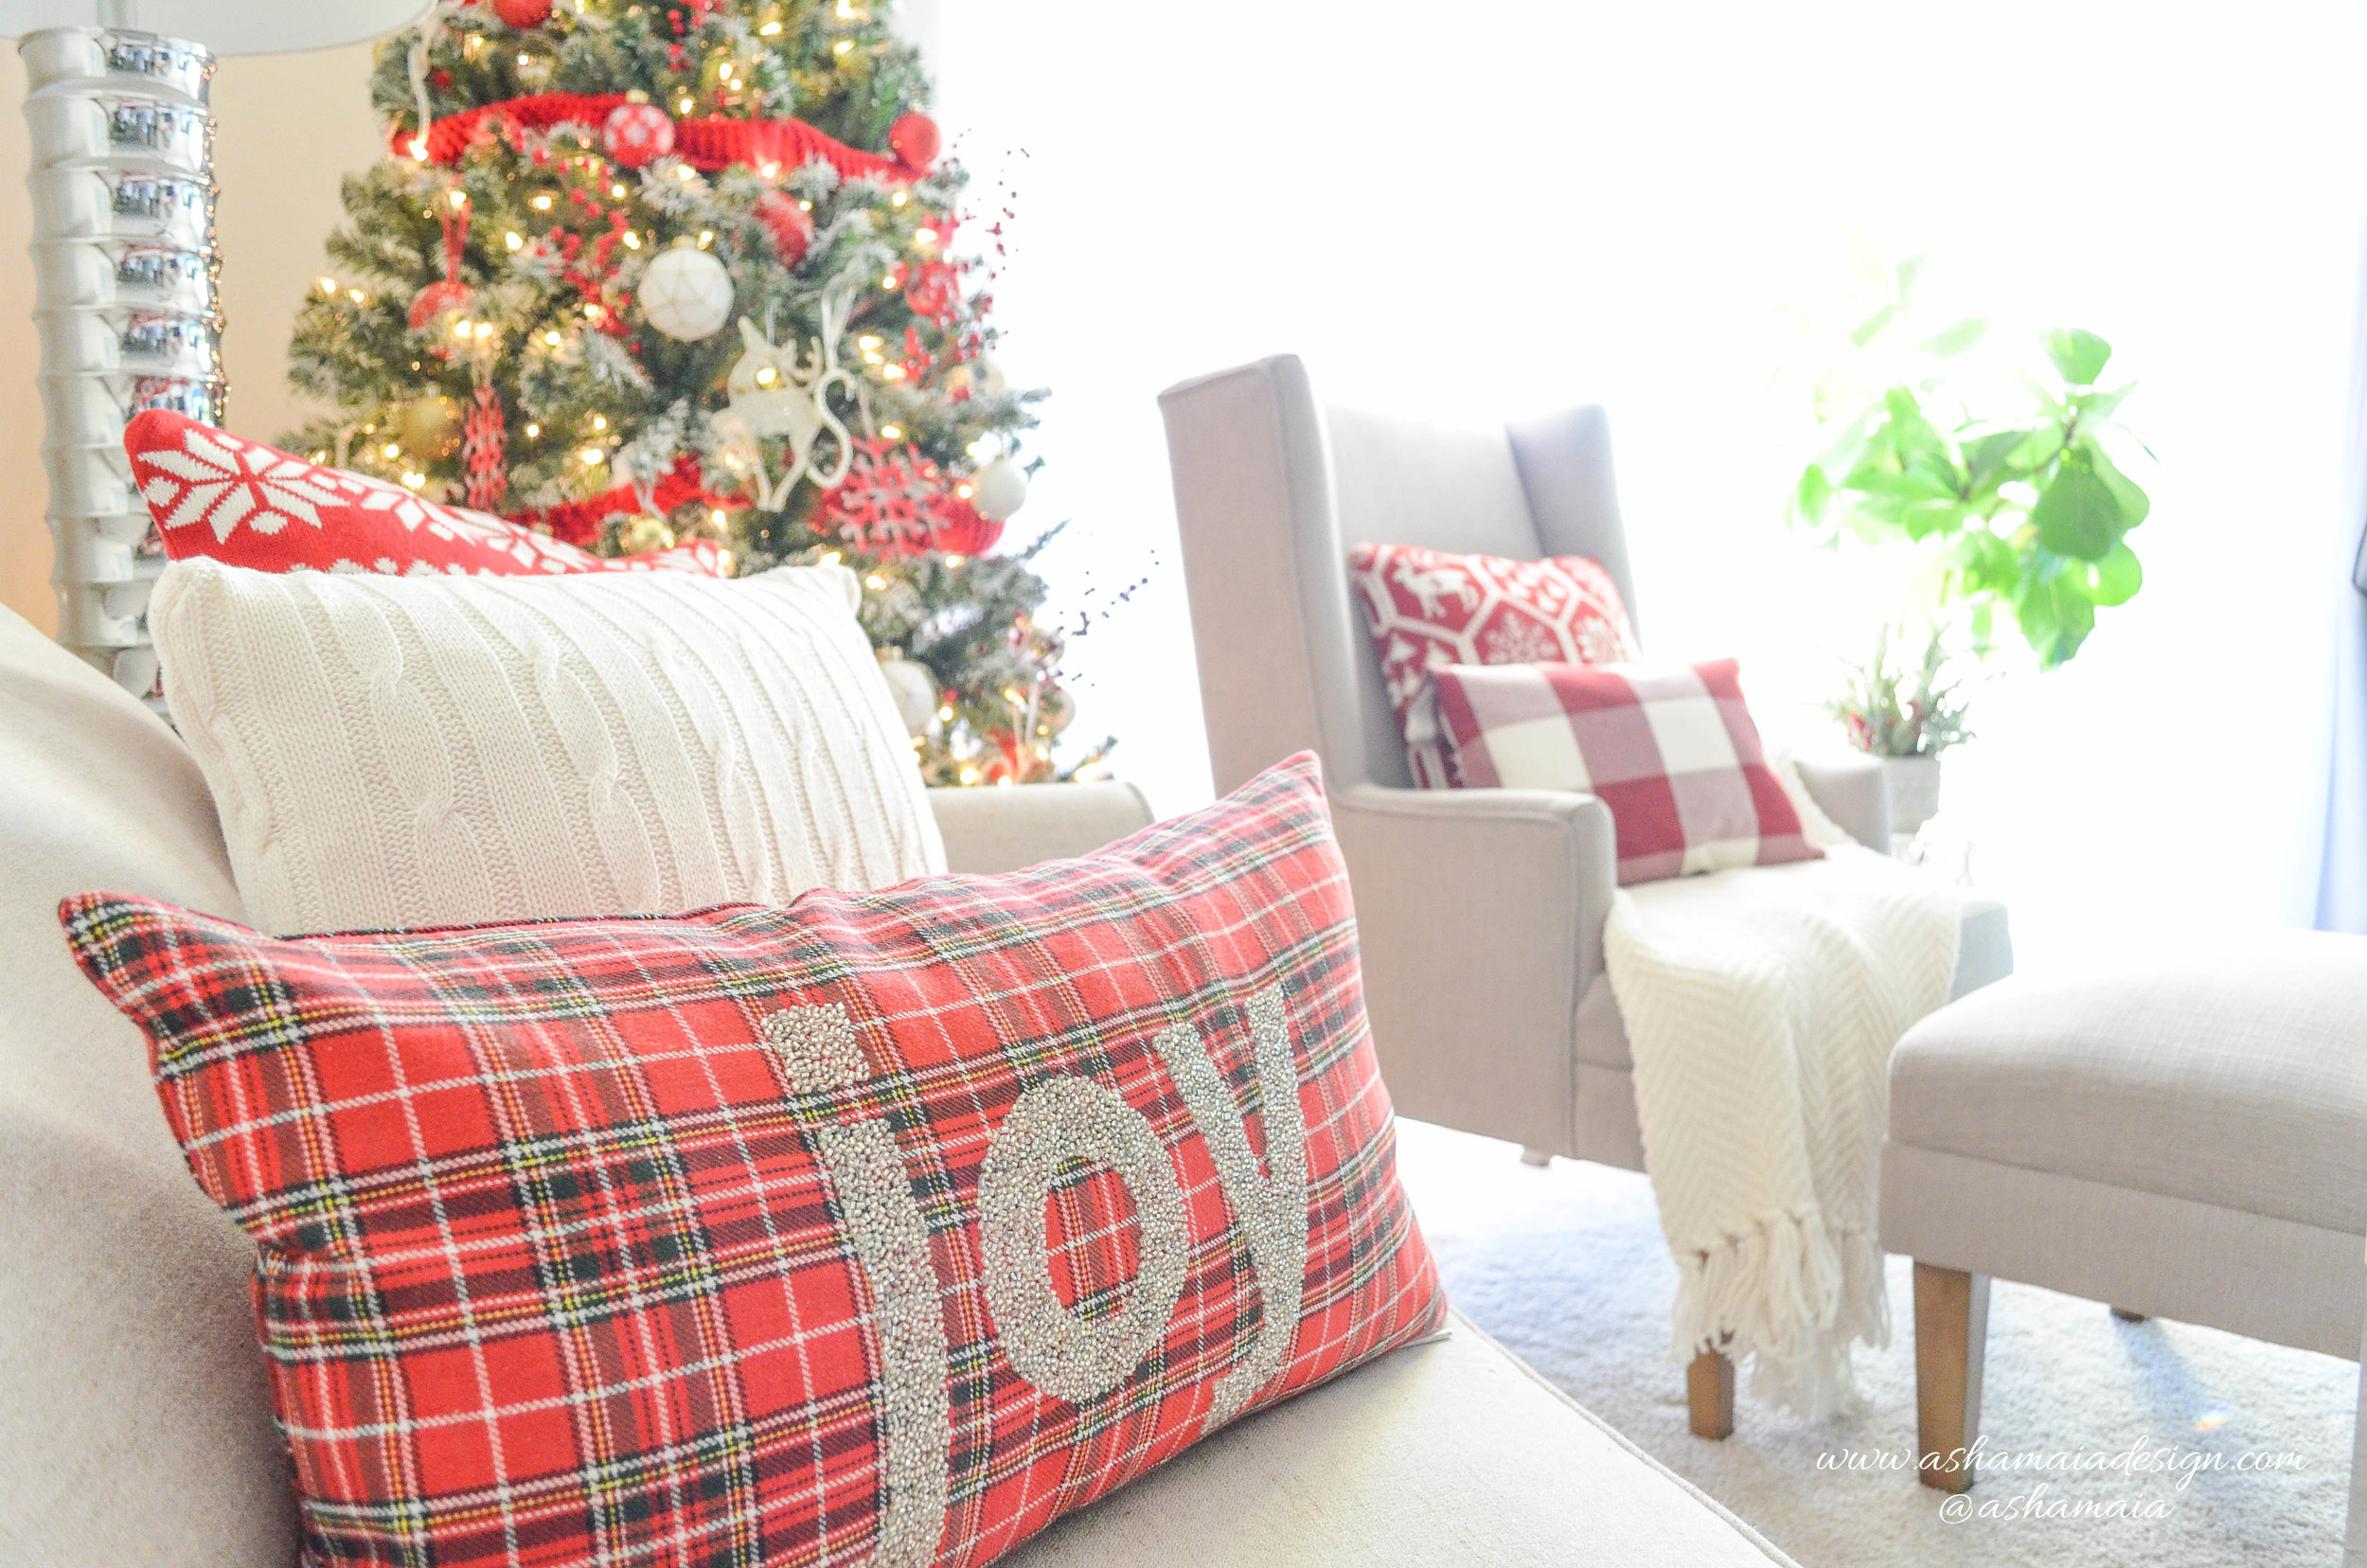 Warm & Cozy Christmas Living Room Decor with Red Buffalo Check Christmas Sweater Throw Pillows and Christmas Tree